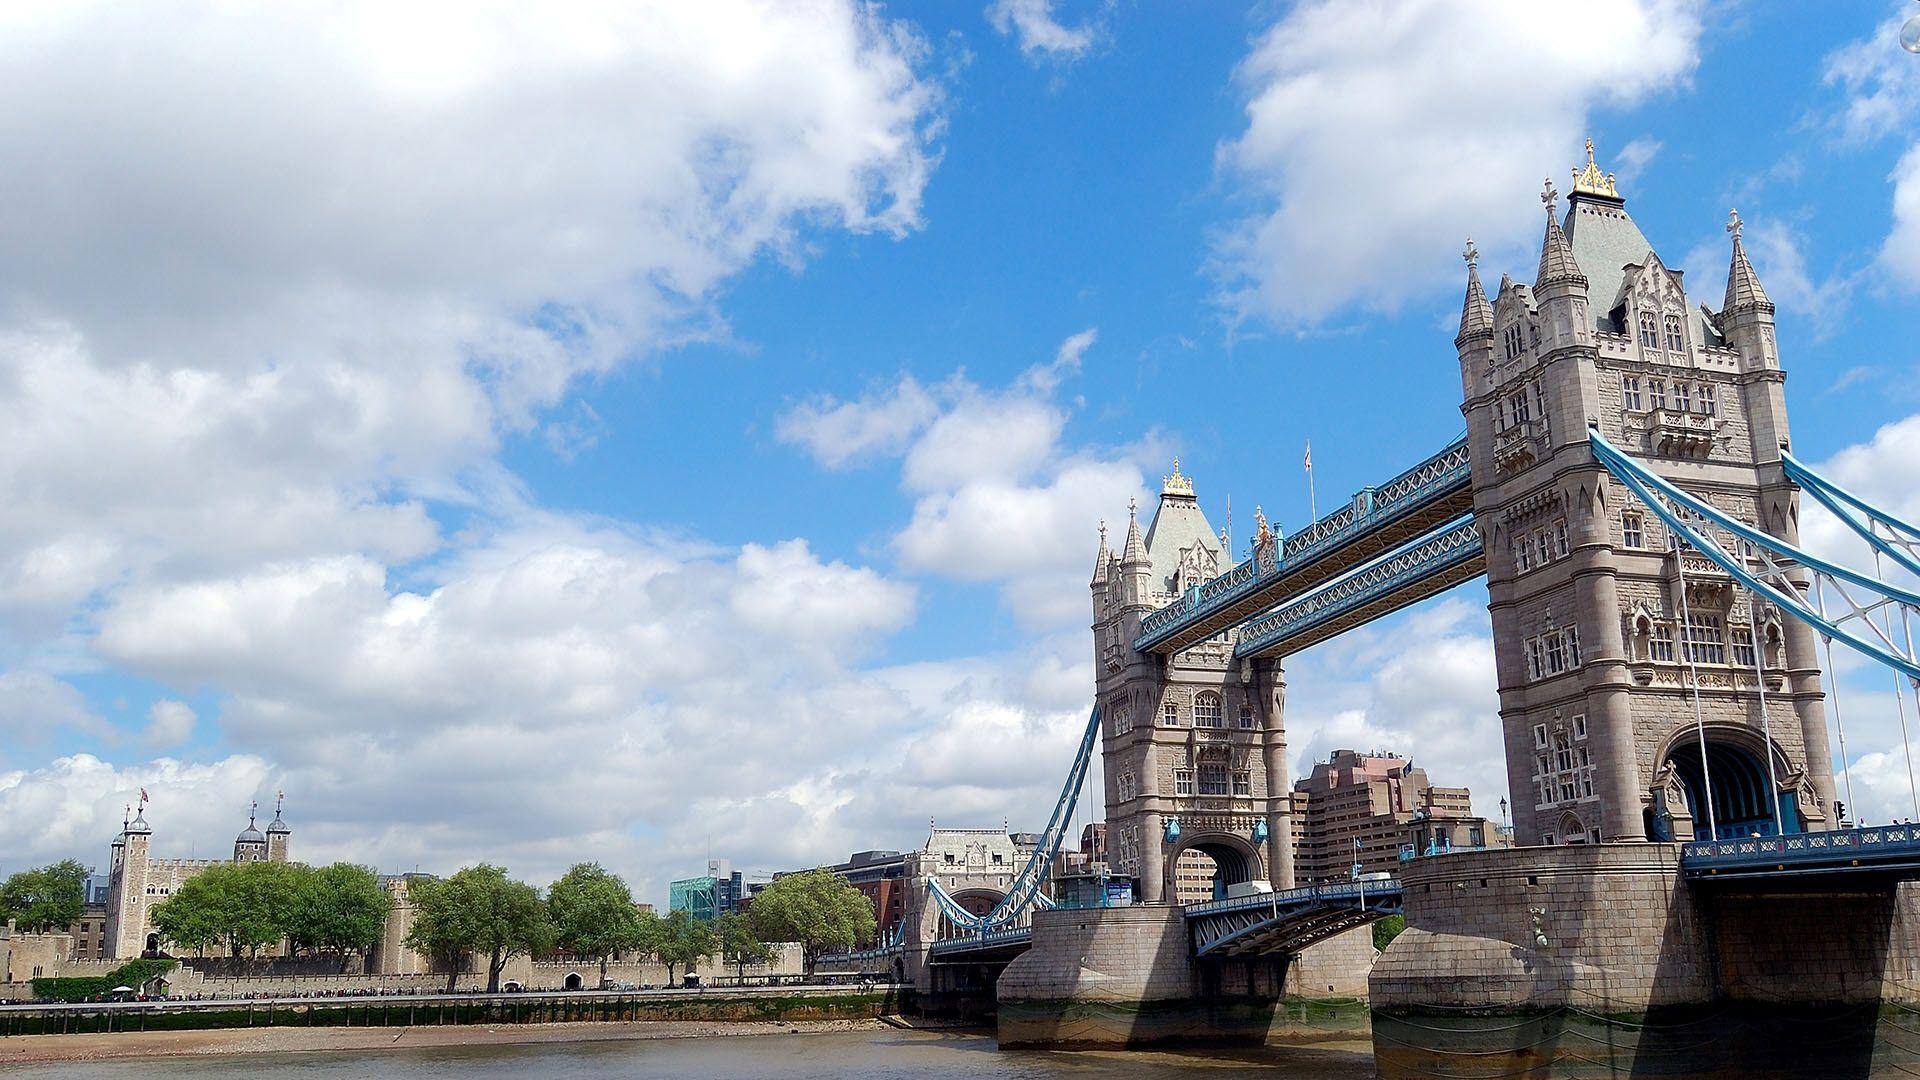 Download Tower Bridge London Hd Desktop Backgrounds, Photos In Hd